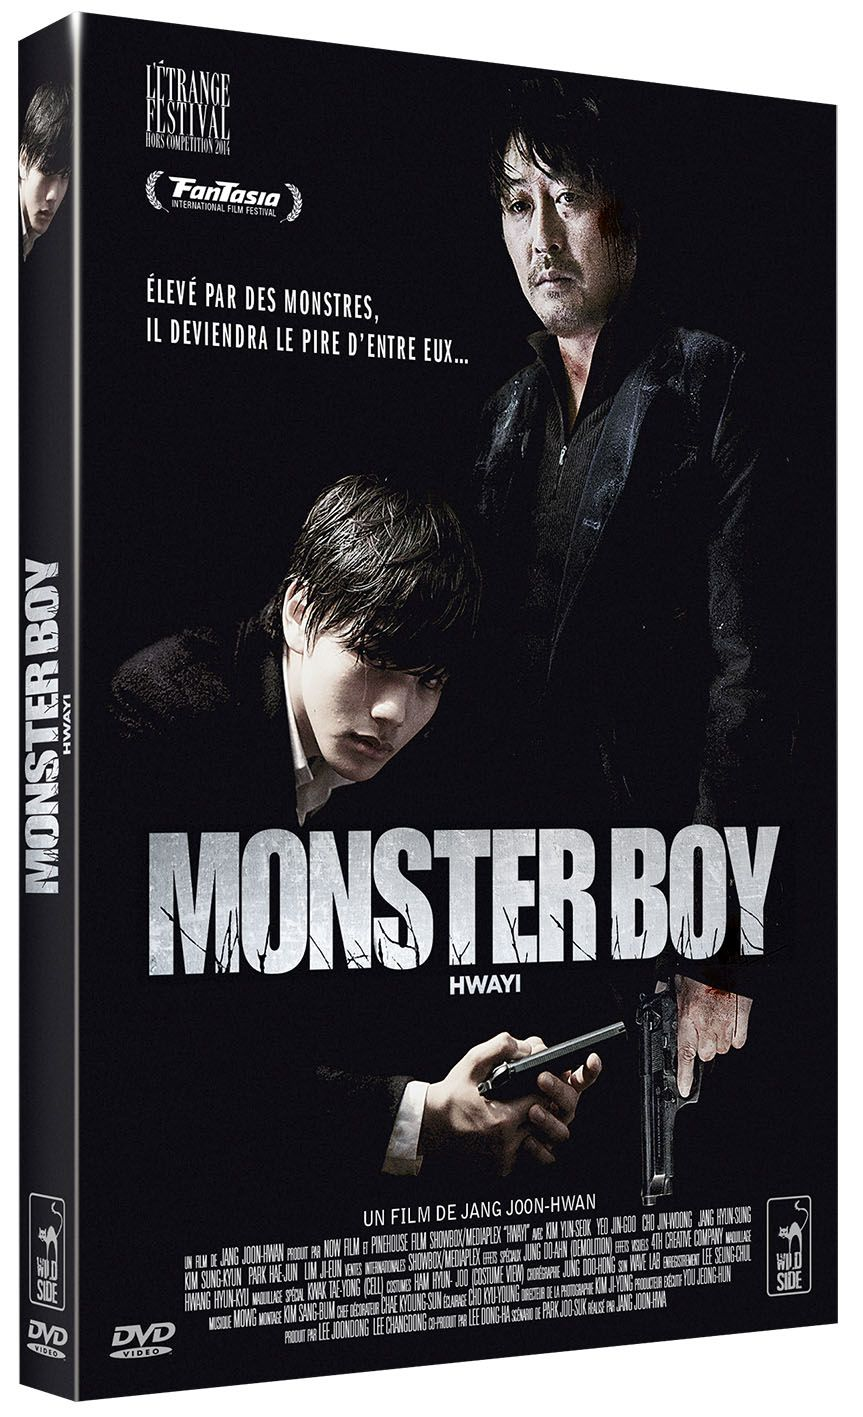 CONCOURS - Monster Boy (Hwayi) ; des DVD à gagner !